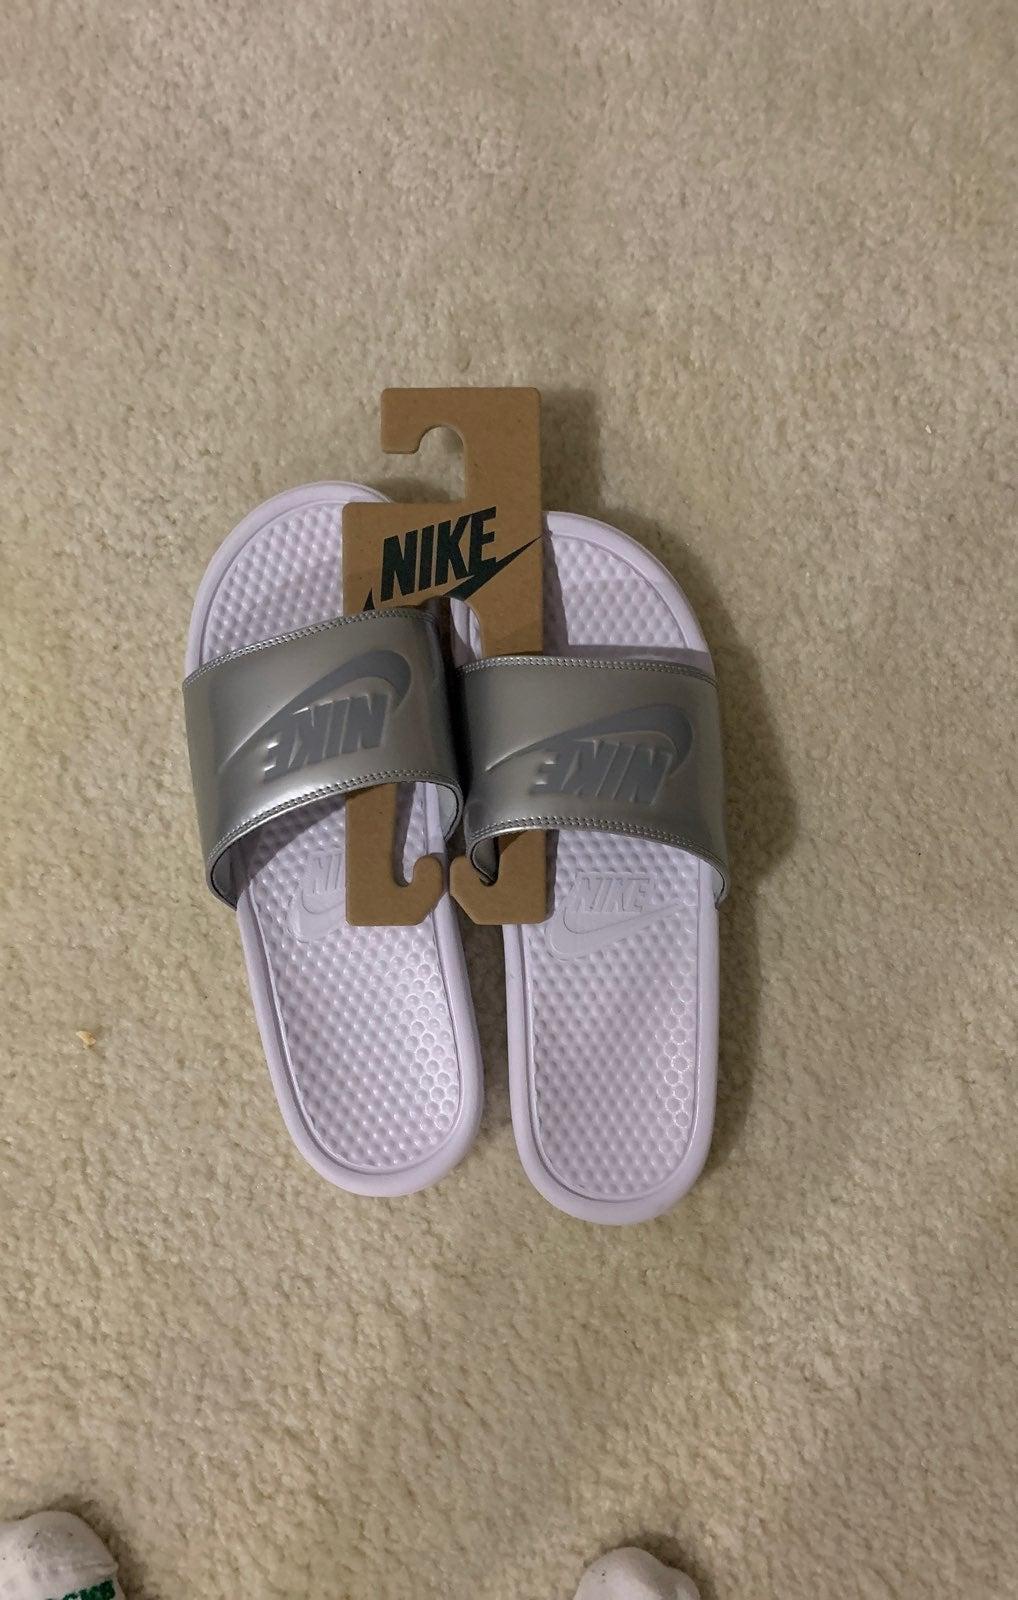 Nike slides women